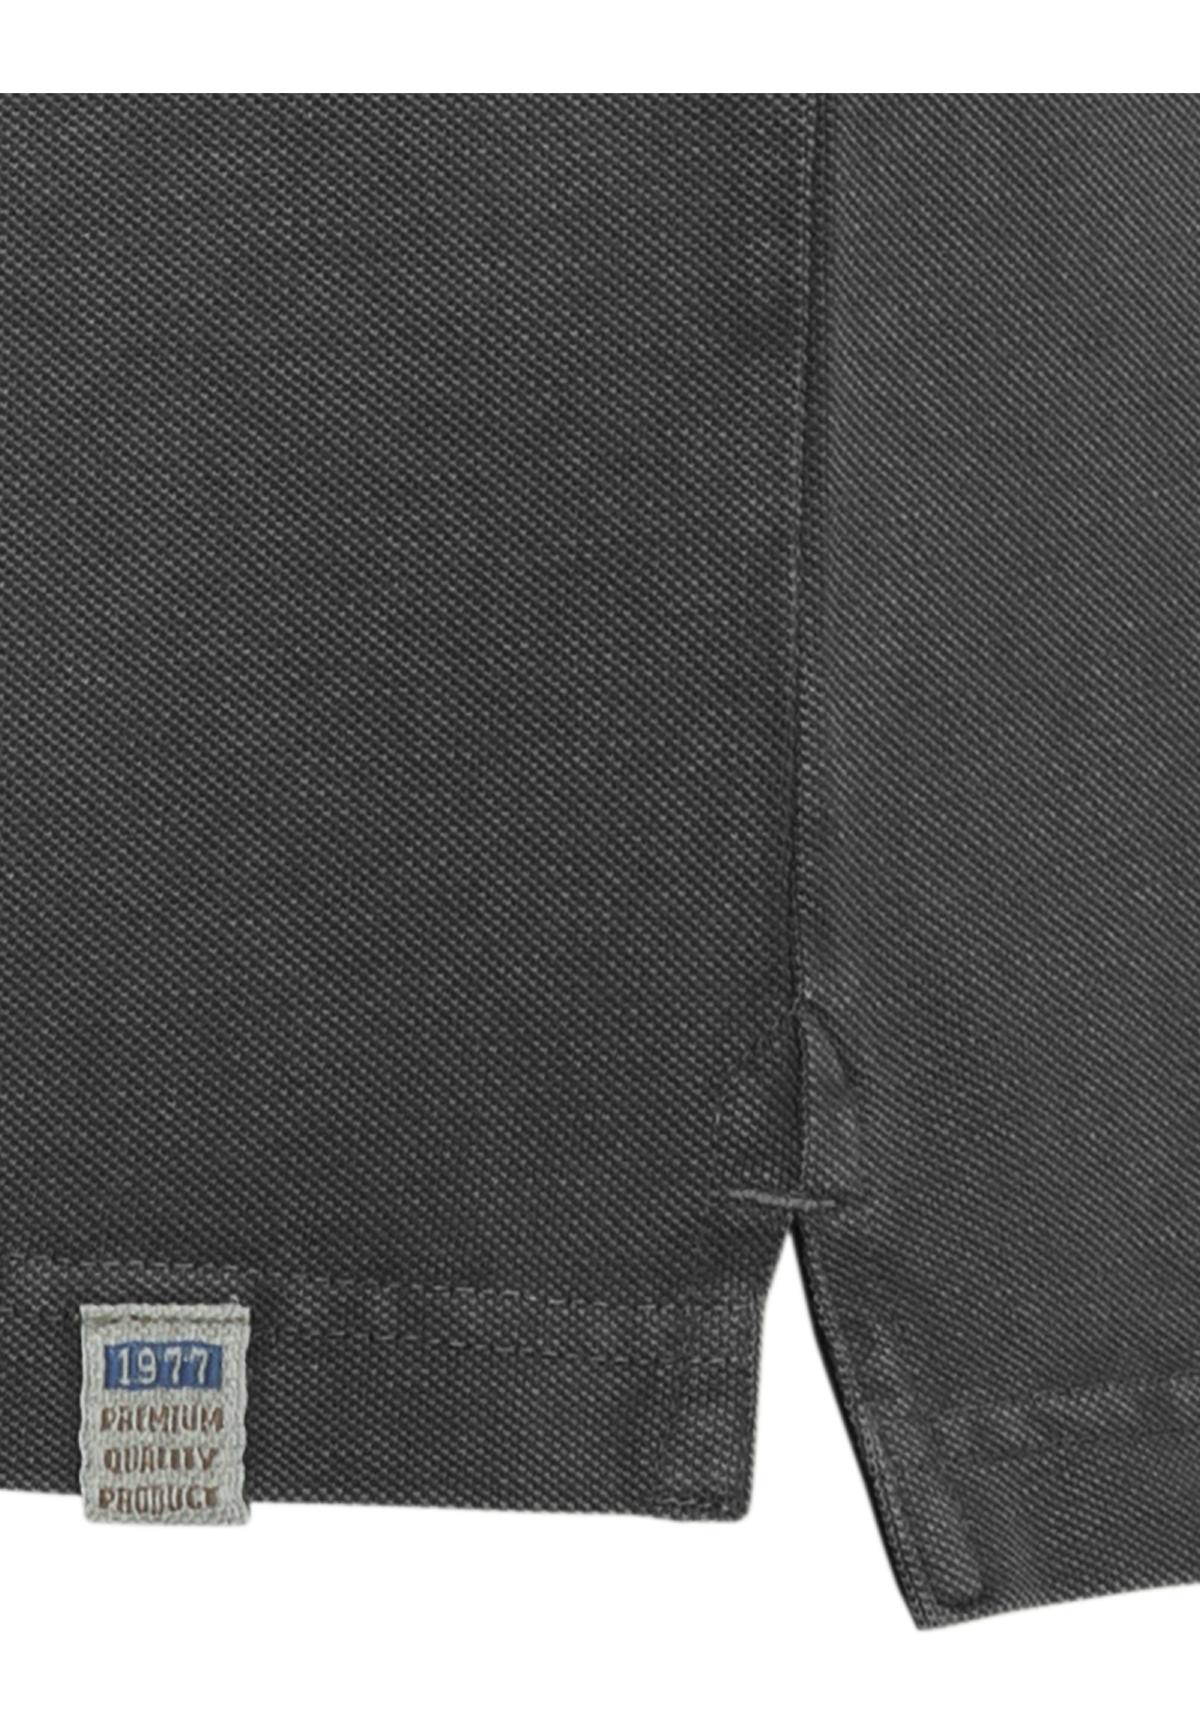 Camel-Active-Herren-Shirt-Poloshirt-Pique-Regular-Fit-NEU Indexbild 49